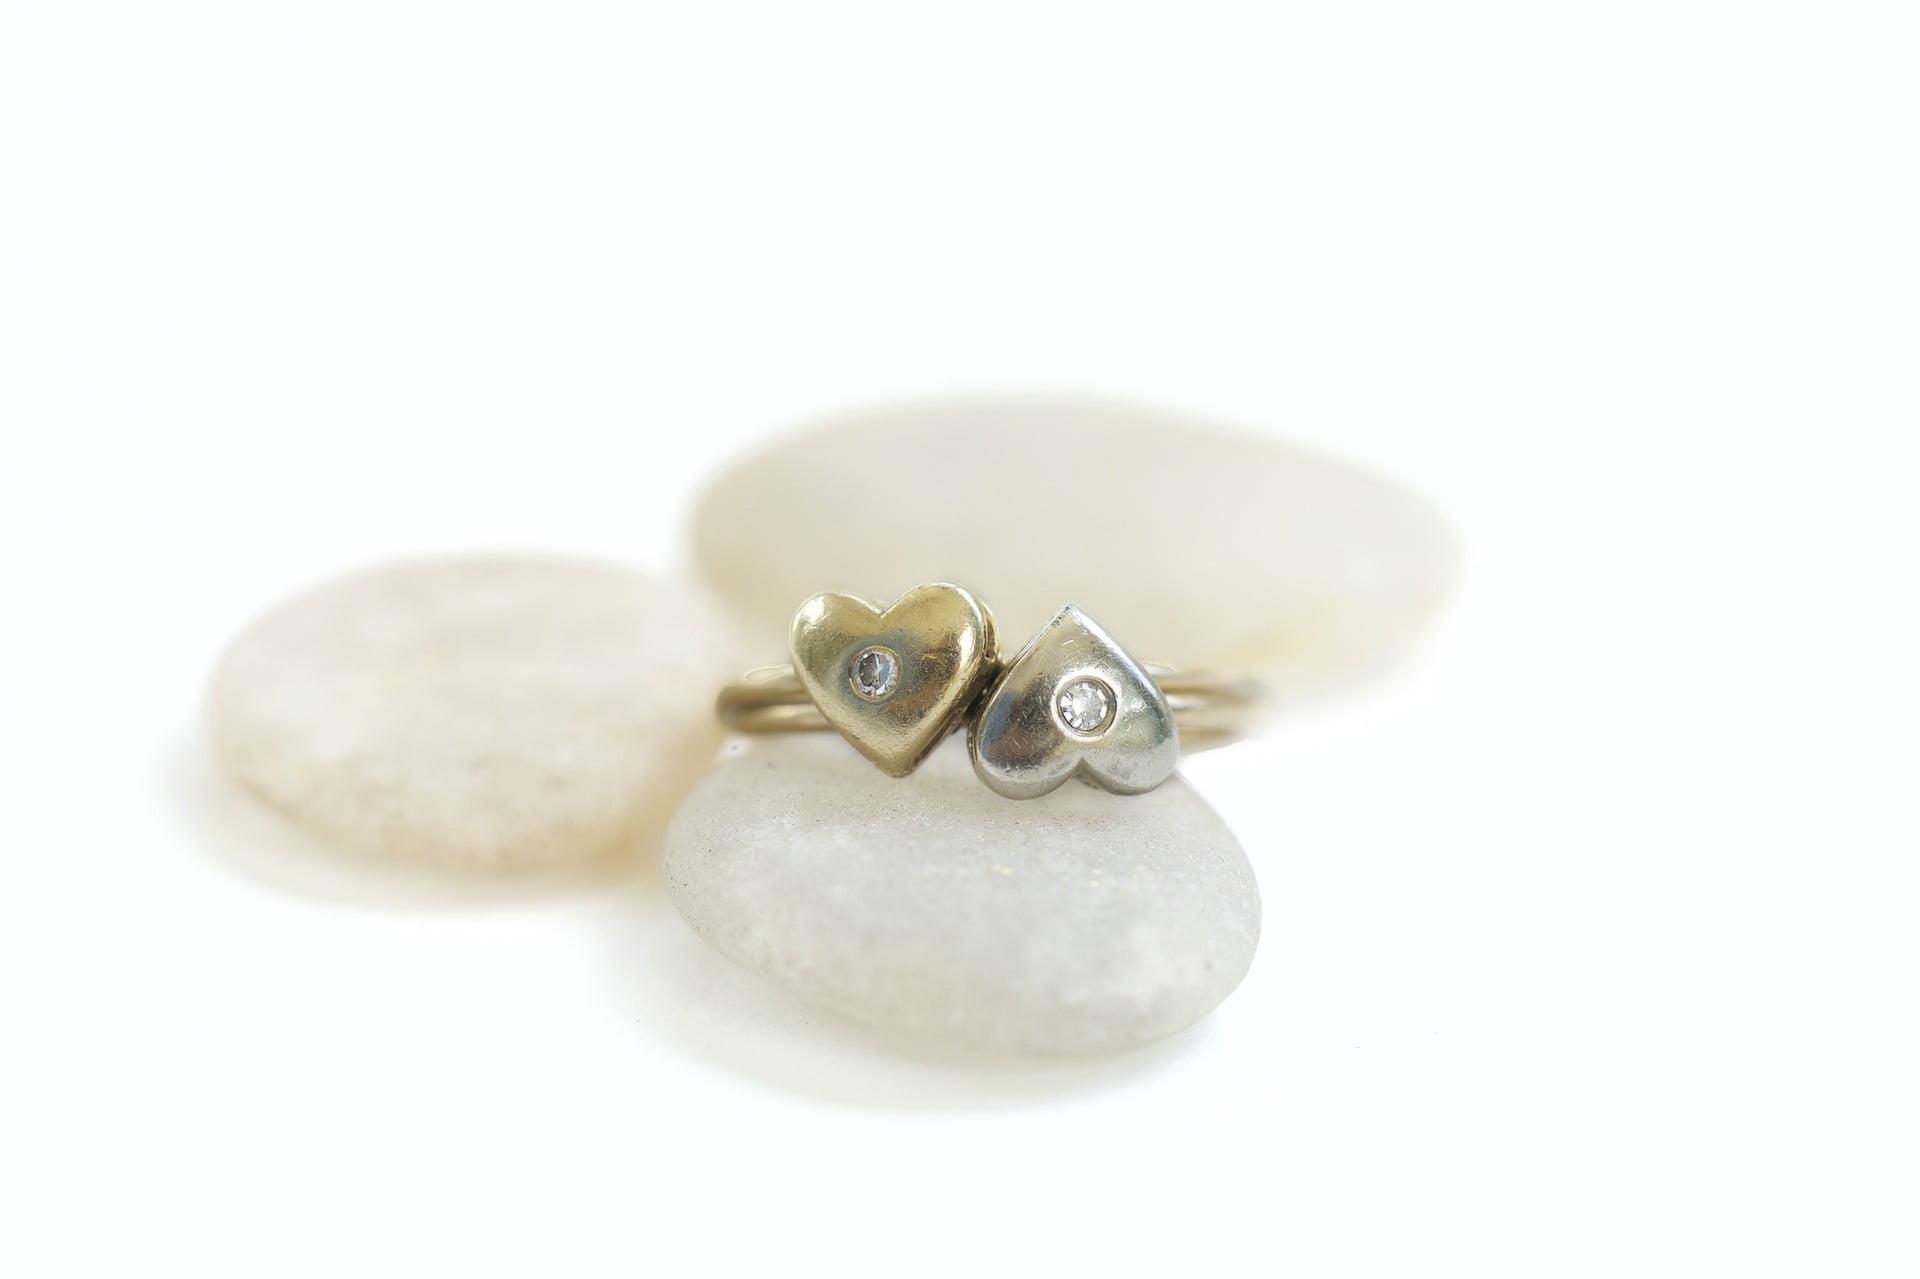 Heart stone rings